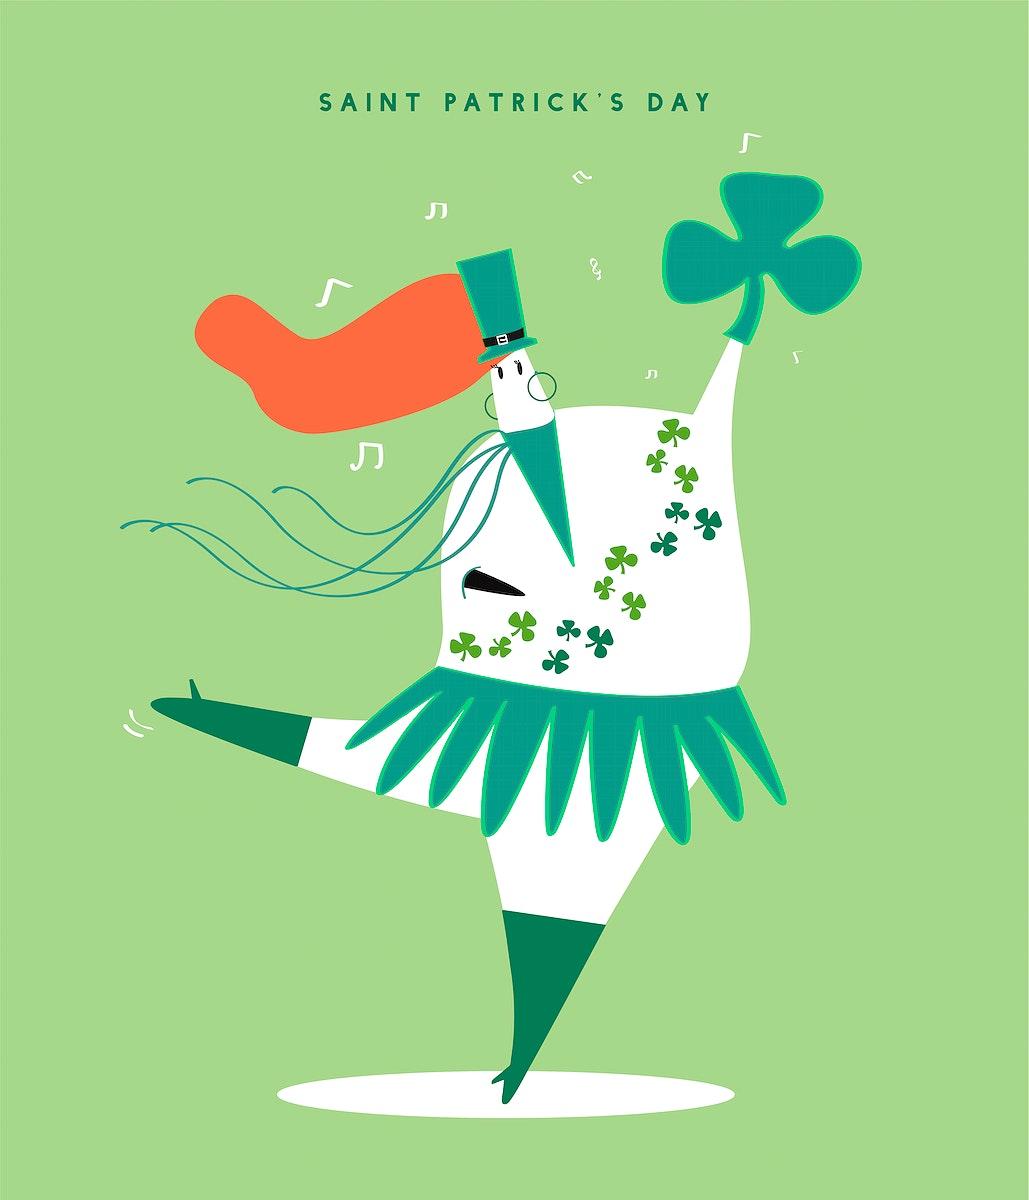 Saint Patrick's day concept illustration